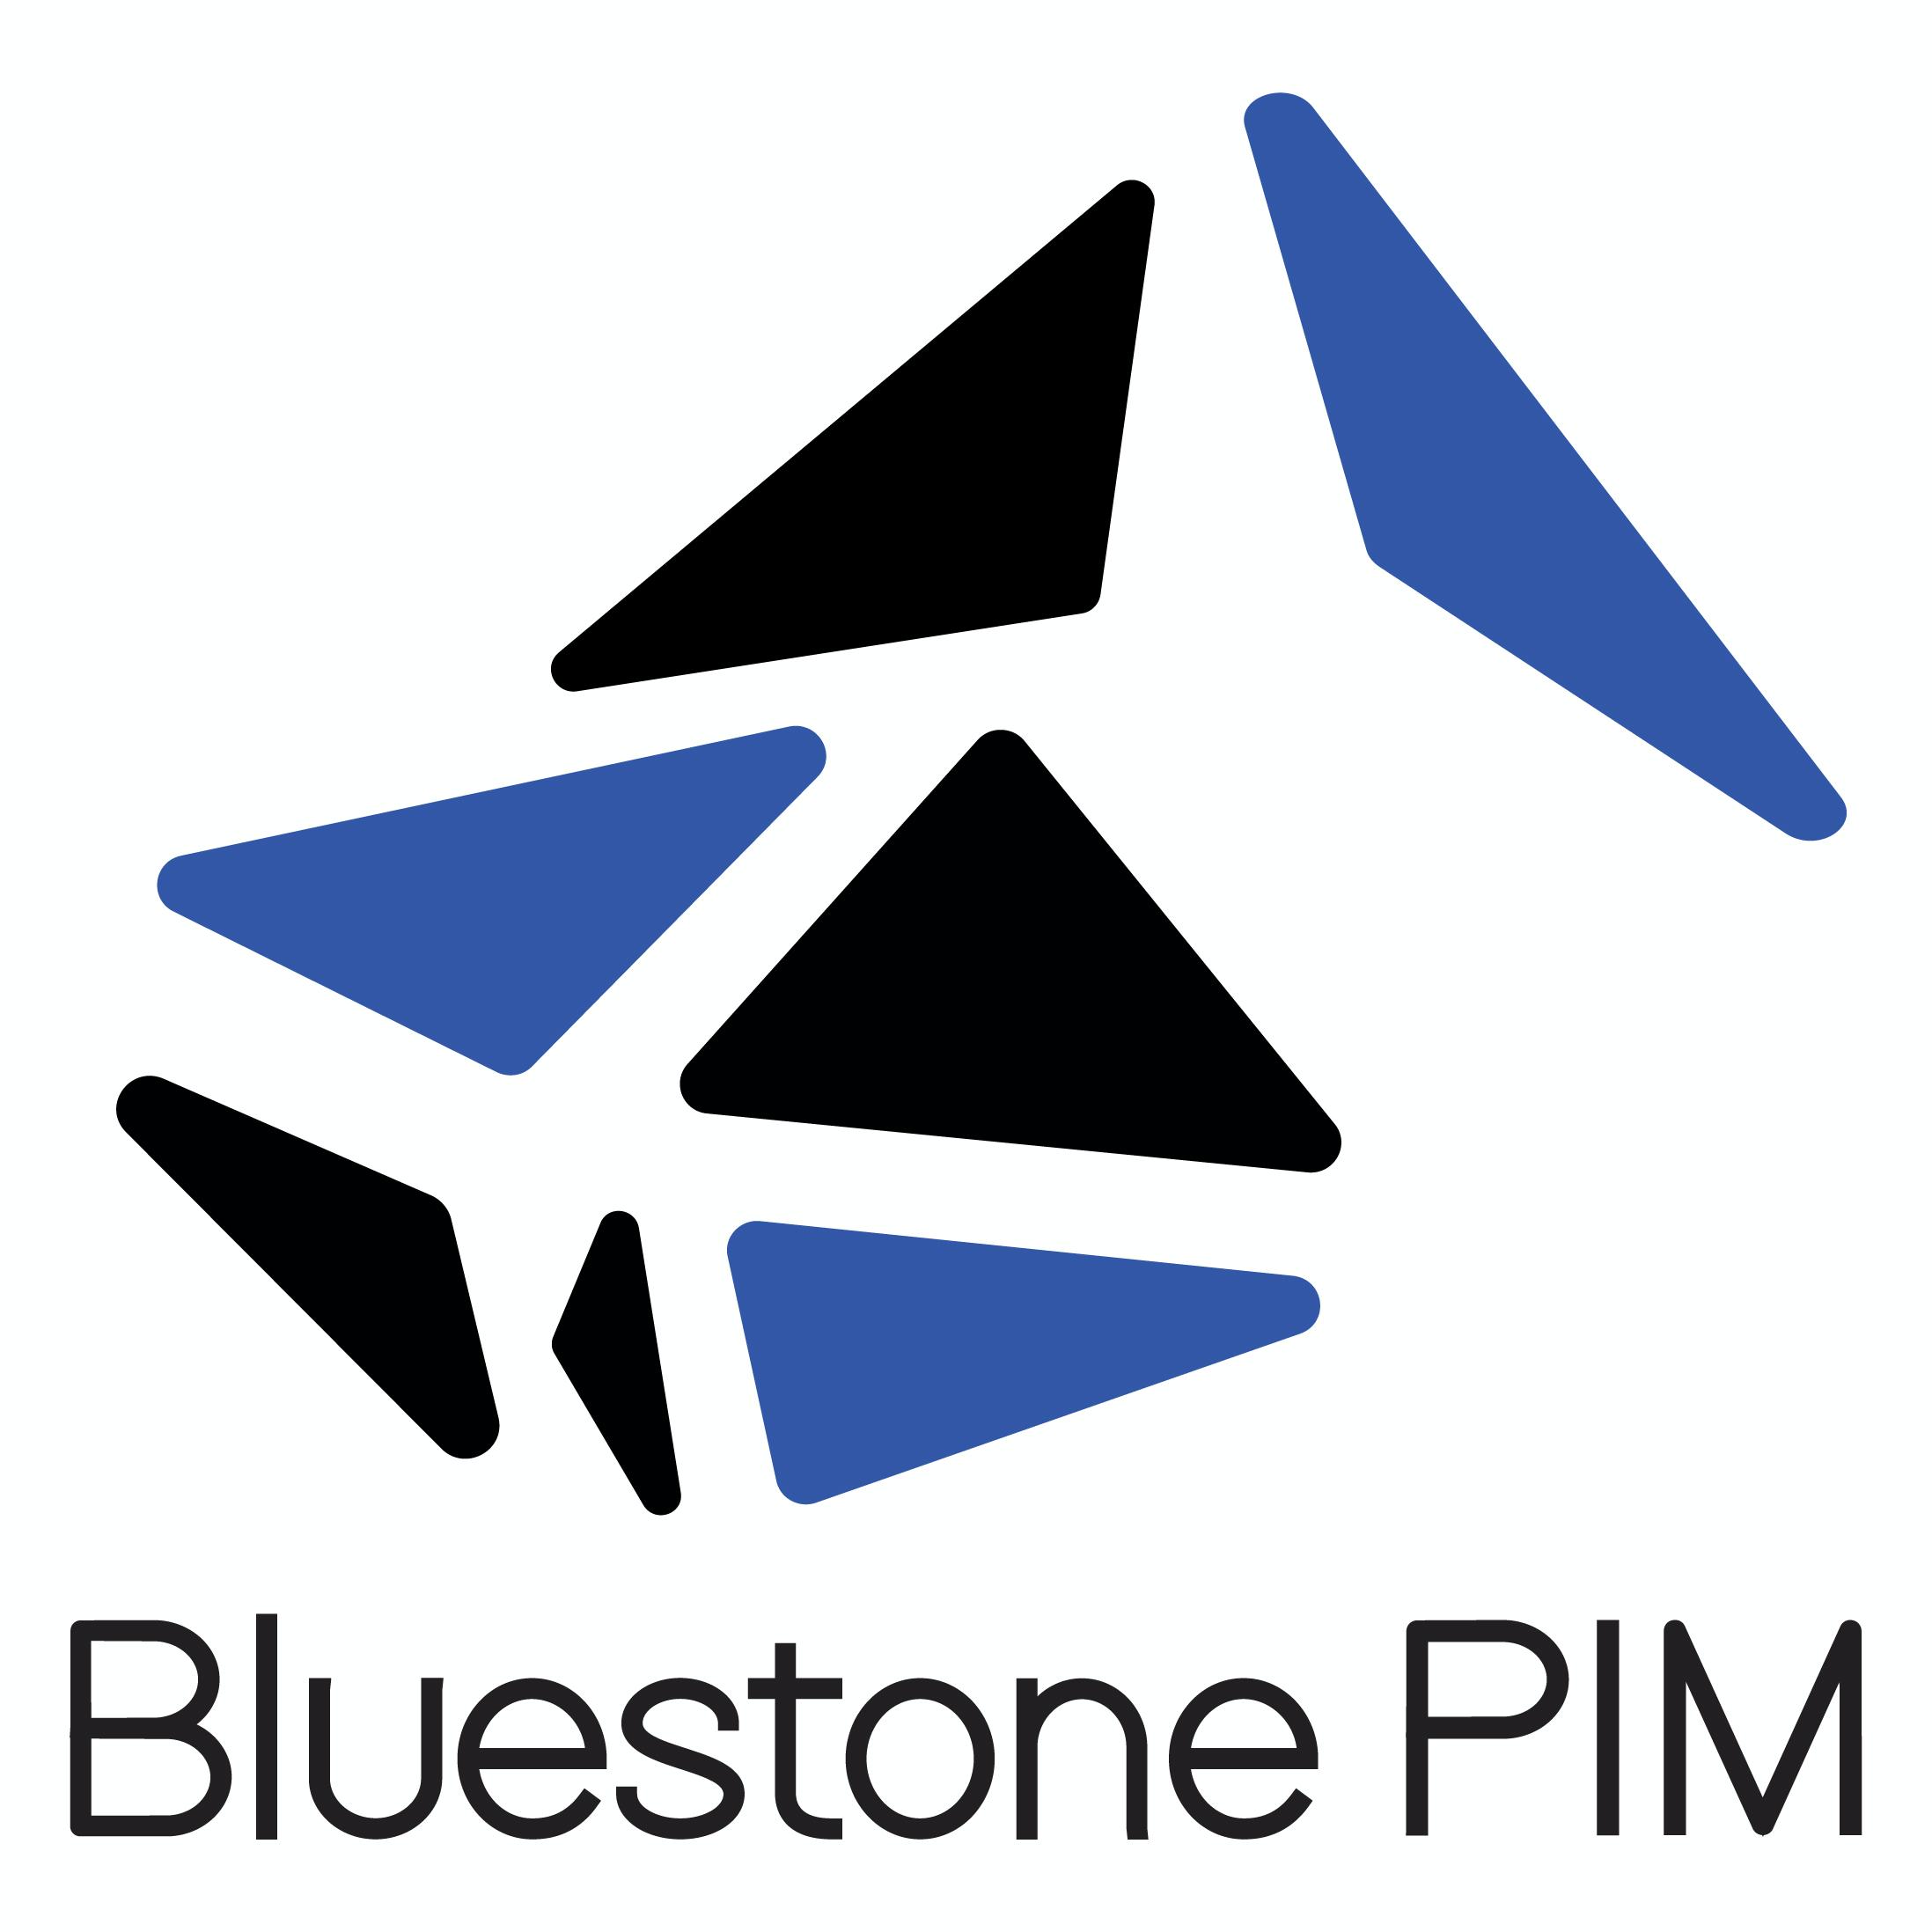 Bluestone PIM logo